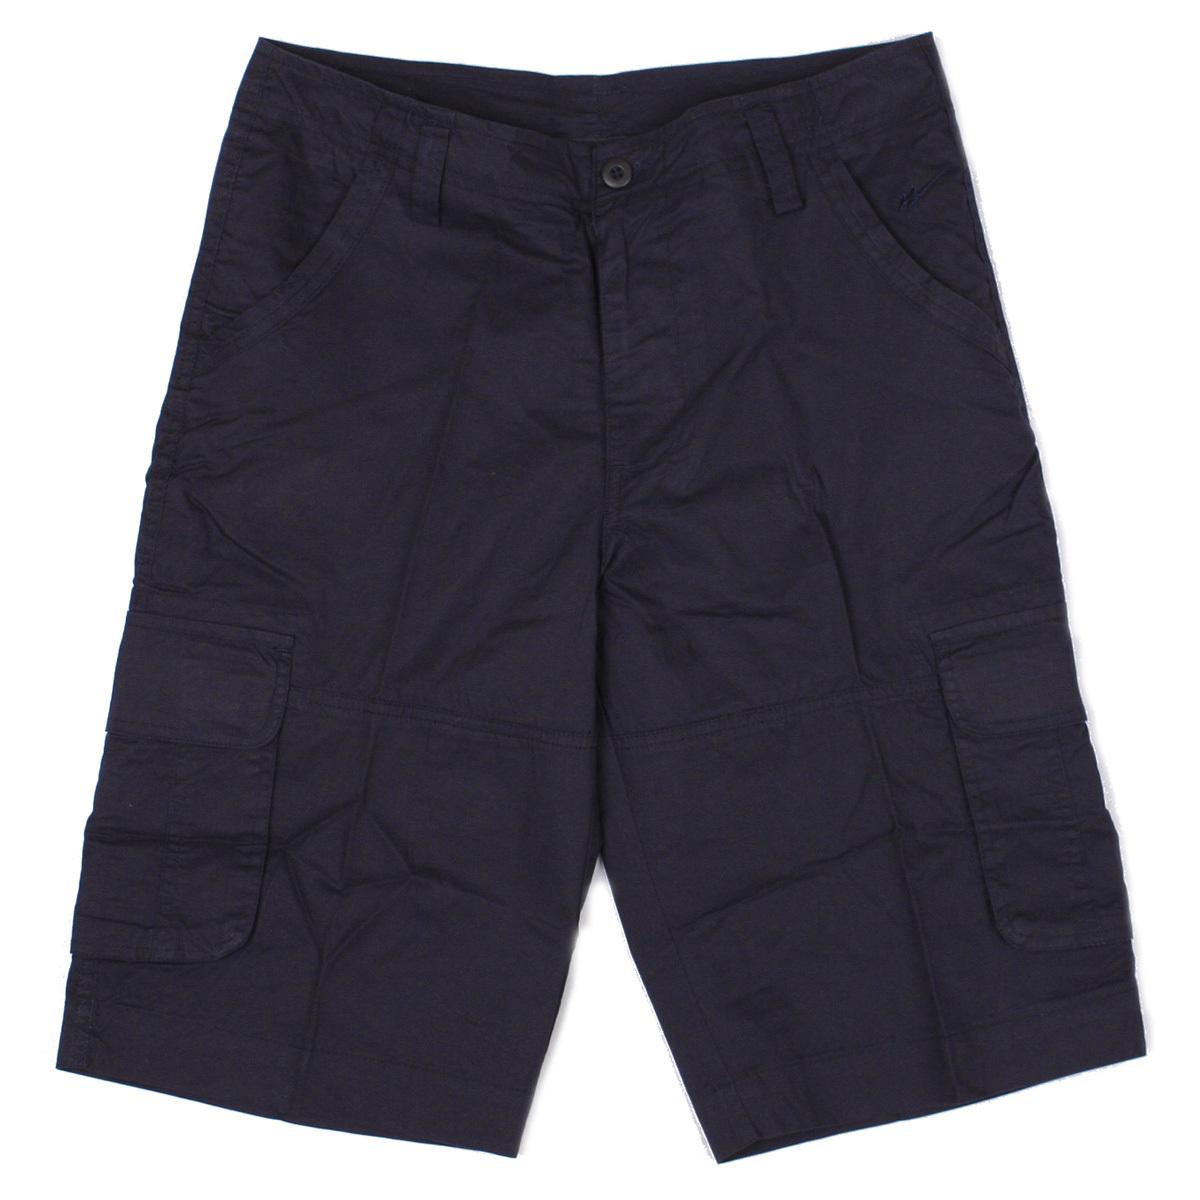 Спортивные шорты DOUBLE STAR ockm/3k745 3K745 Для мужчин